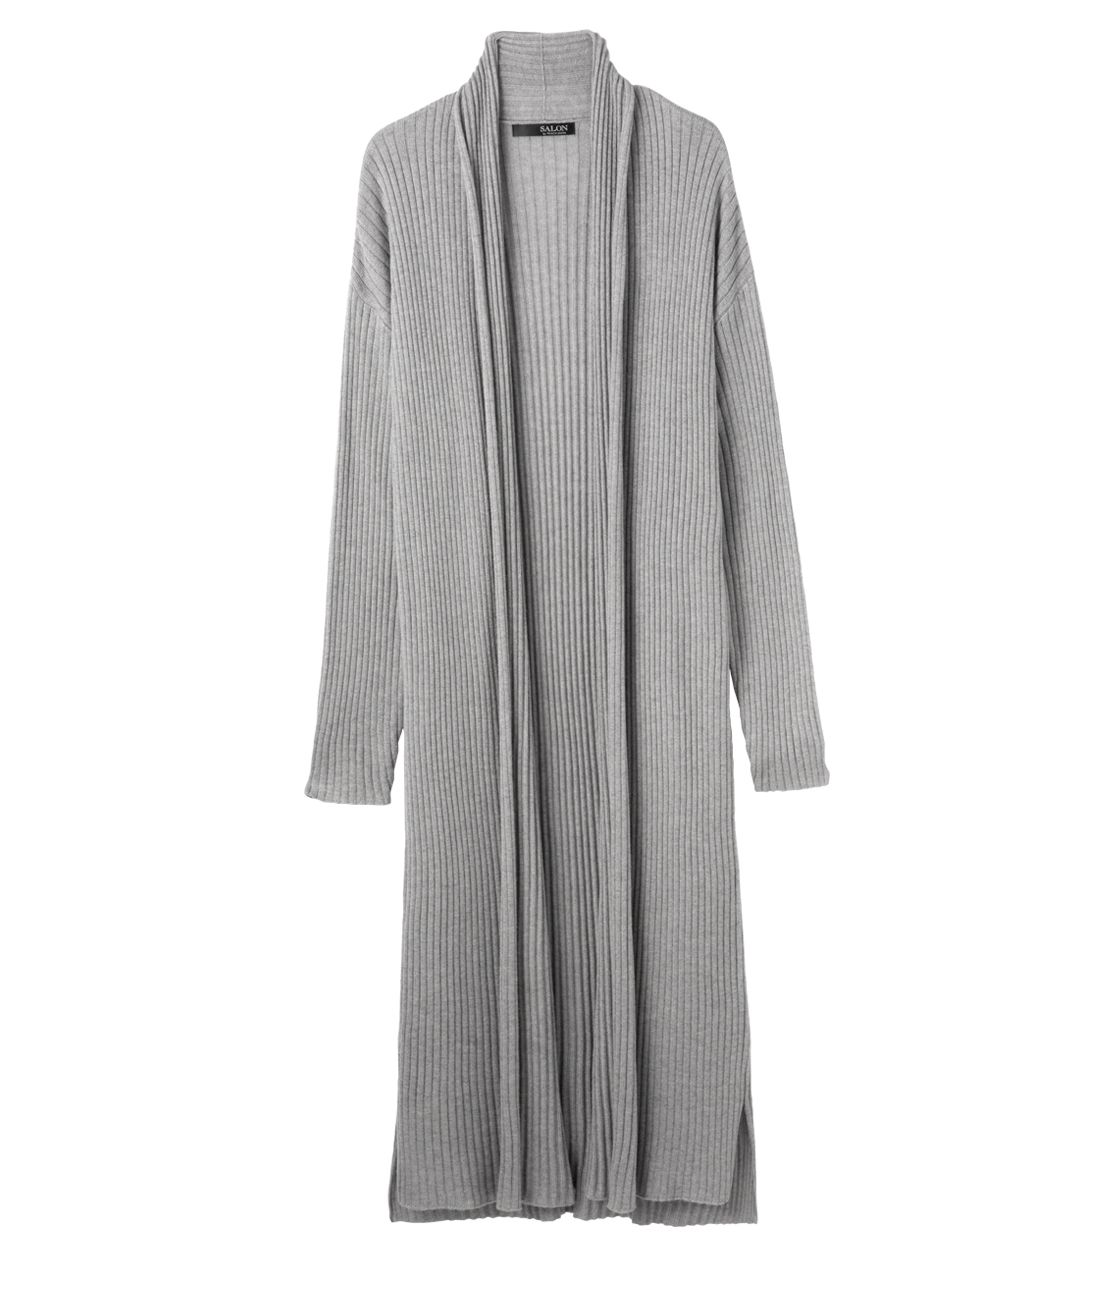 Casimiyatouchnitcocoon gowns